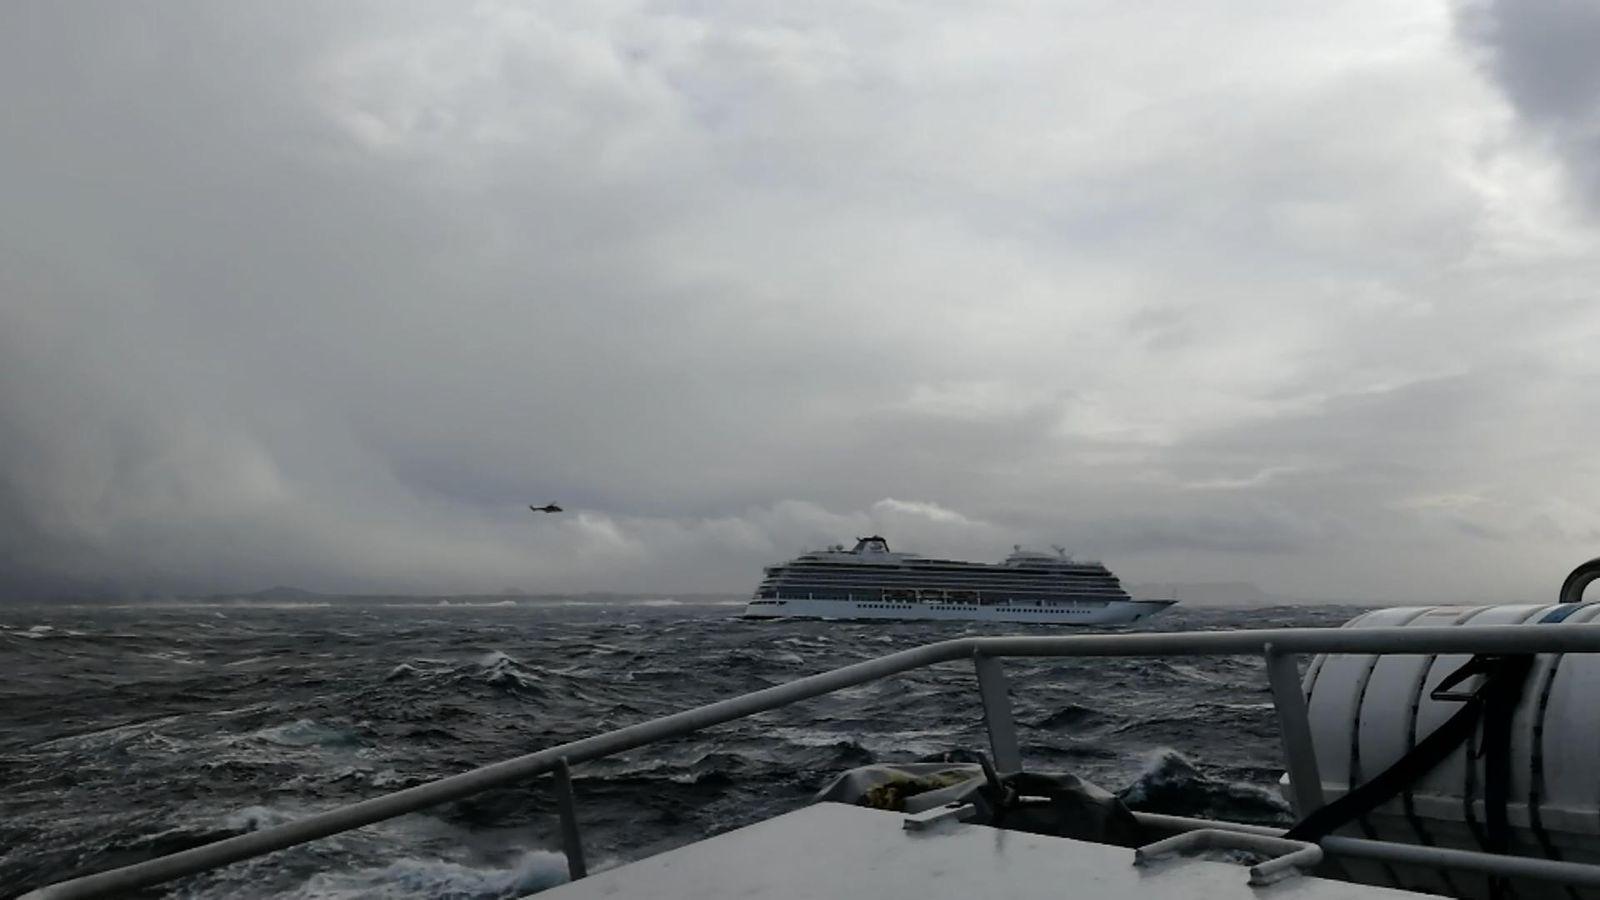 viking sky - photo #38